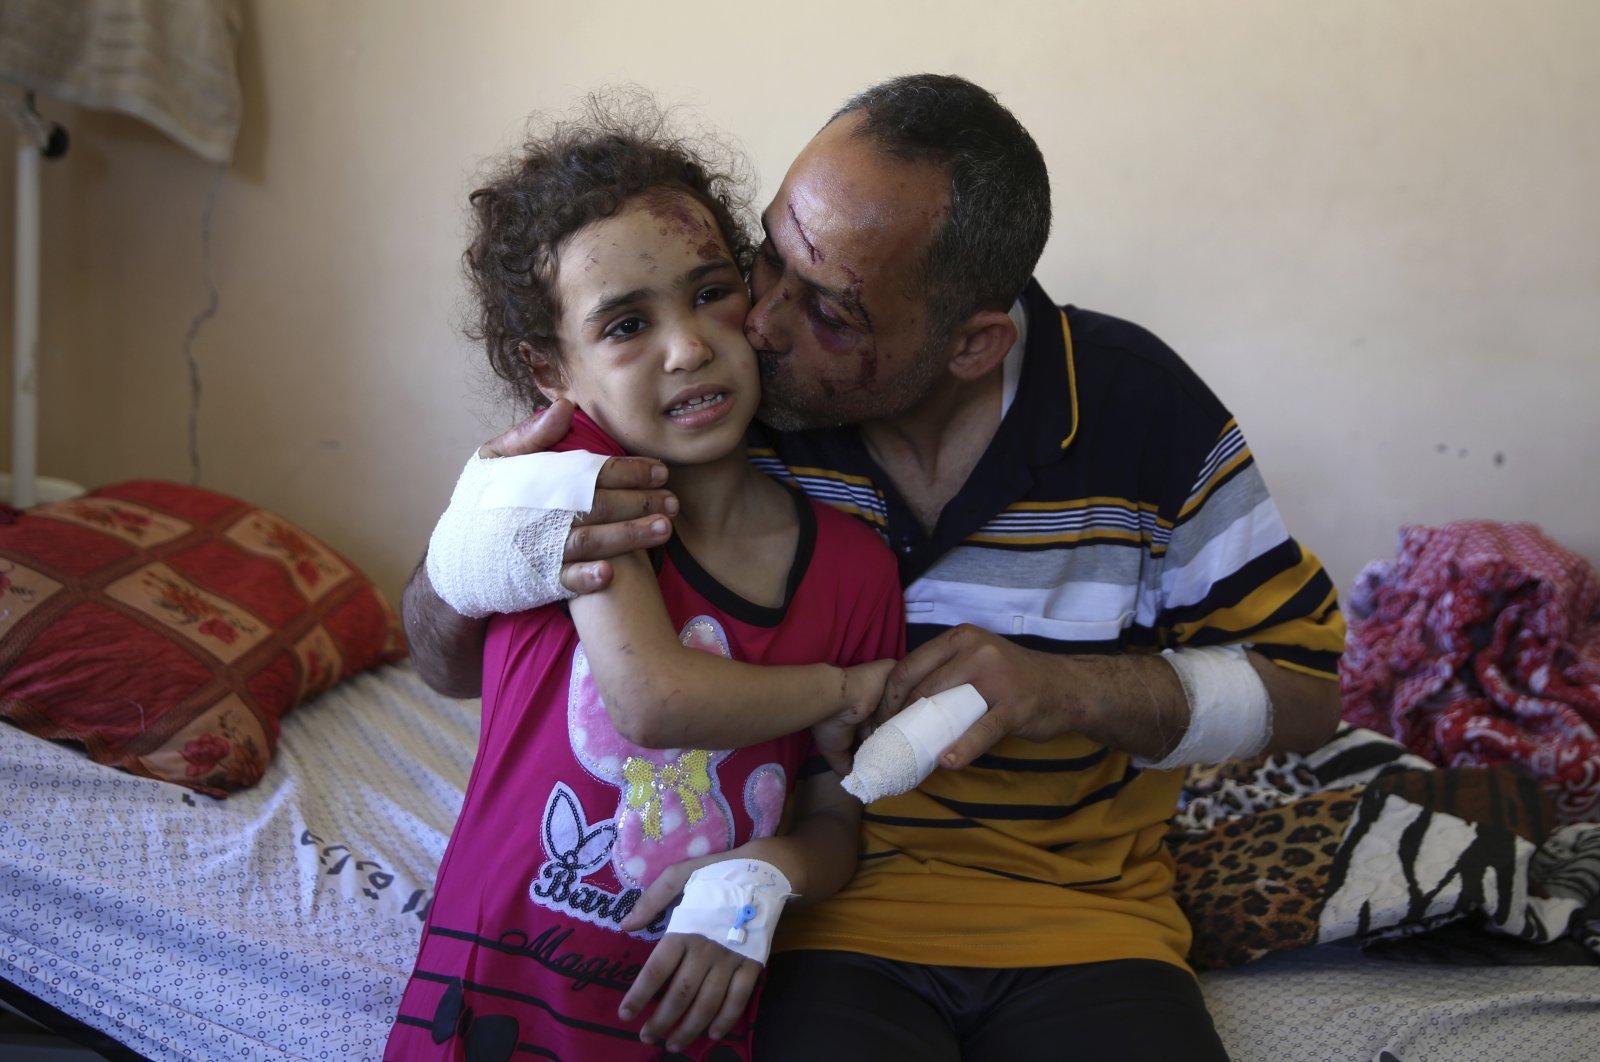 Suzy Ishkontana, 7, is kissed by her father Riad Ishkontana, 42, at Shifa Hospital in Gaza City, Palestine, May 18, 2021. (AP Photo)